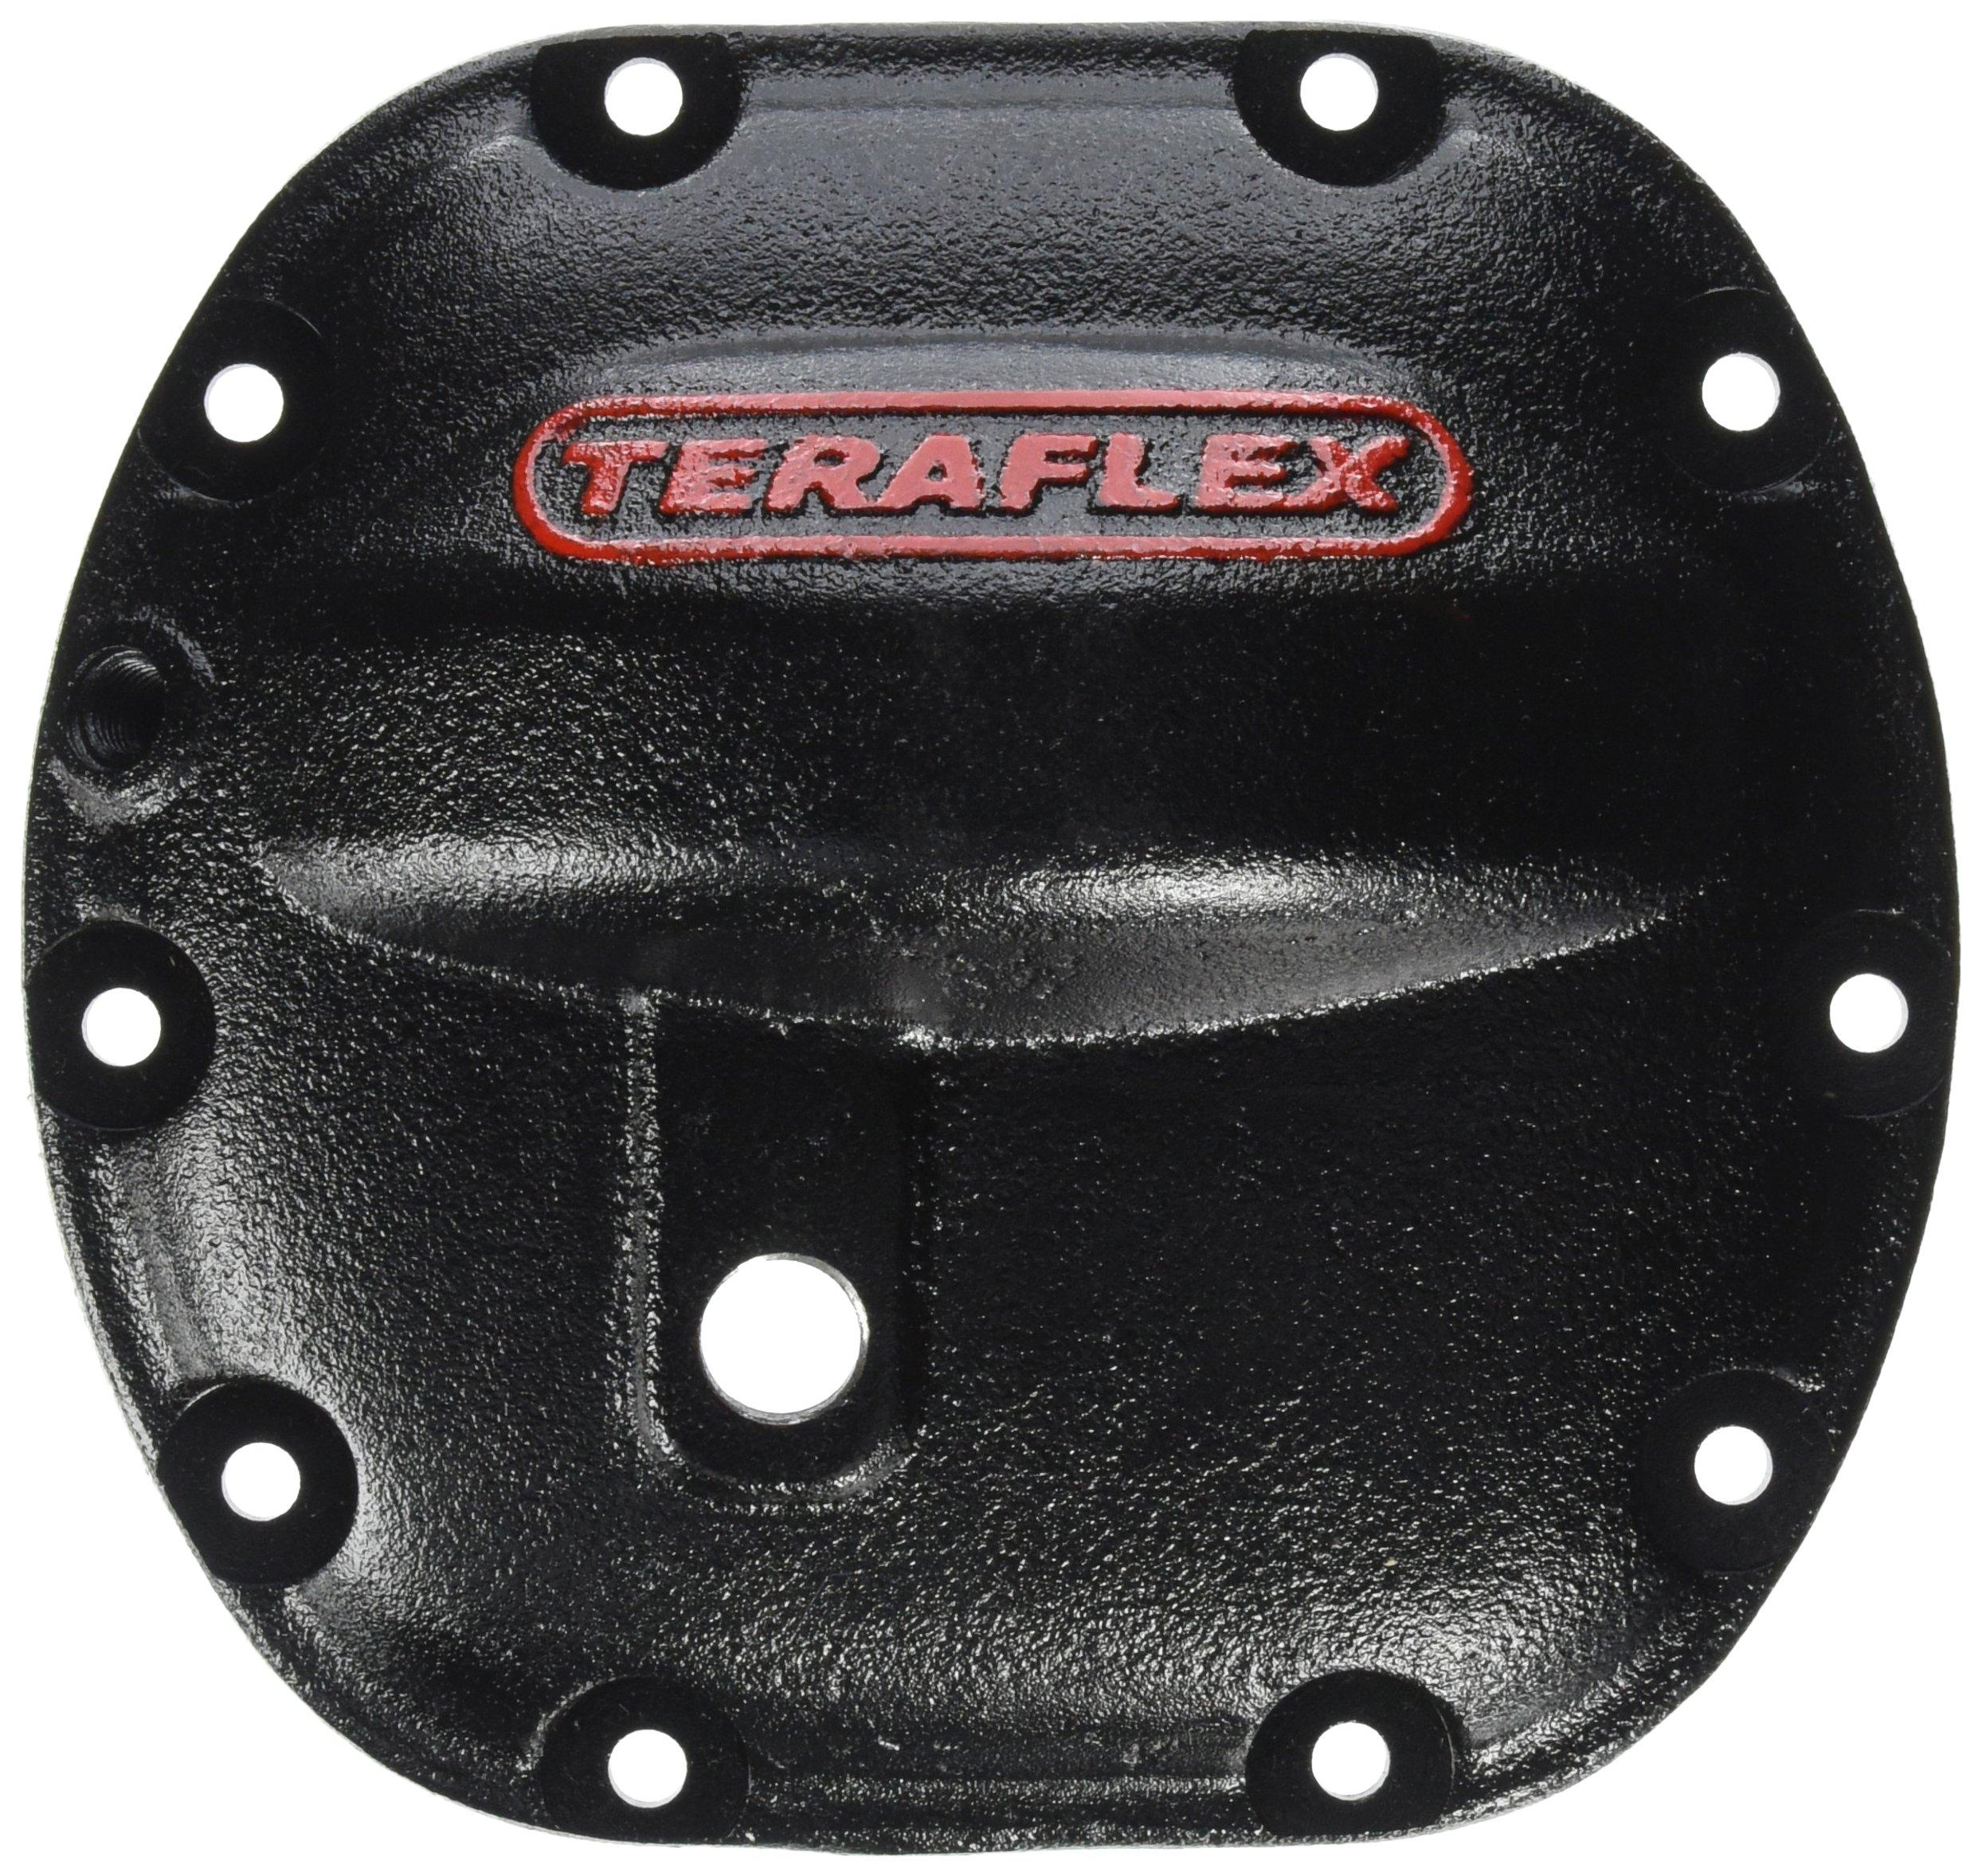 TeraFlex 3990630 Differential Cover Kit (Dana 30 HD)